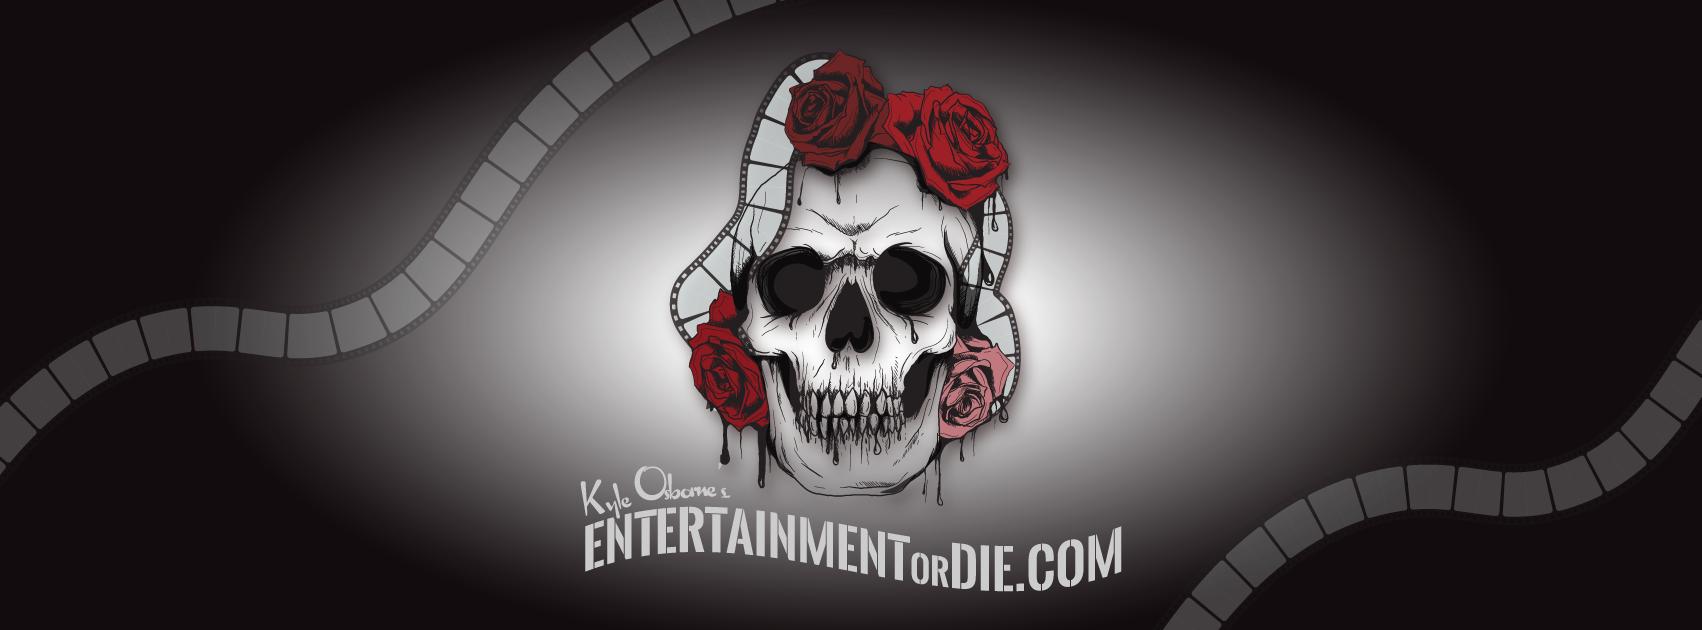 Kyle Osborne's EntertainmentOrDie.Com